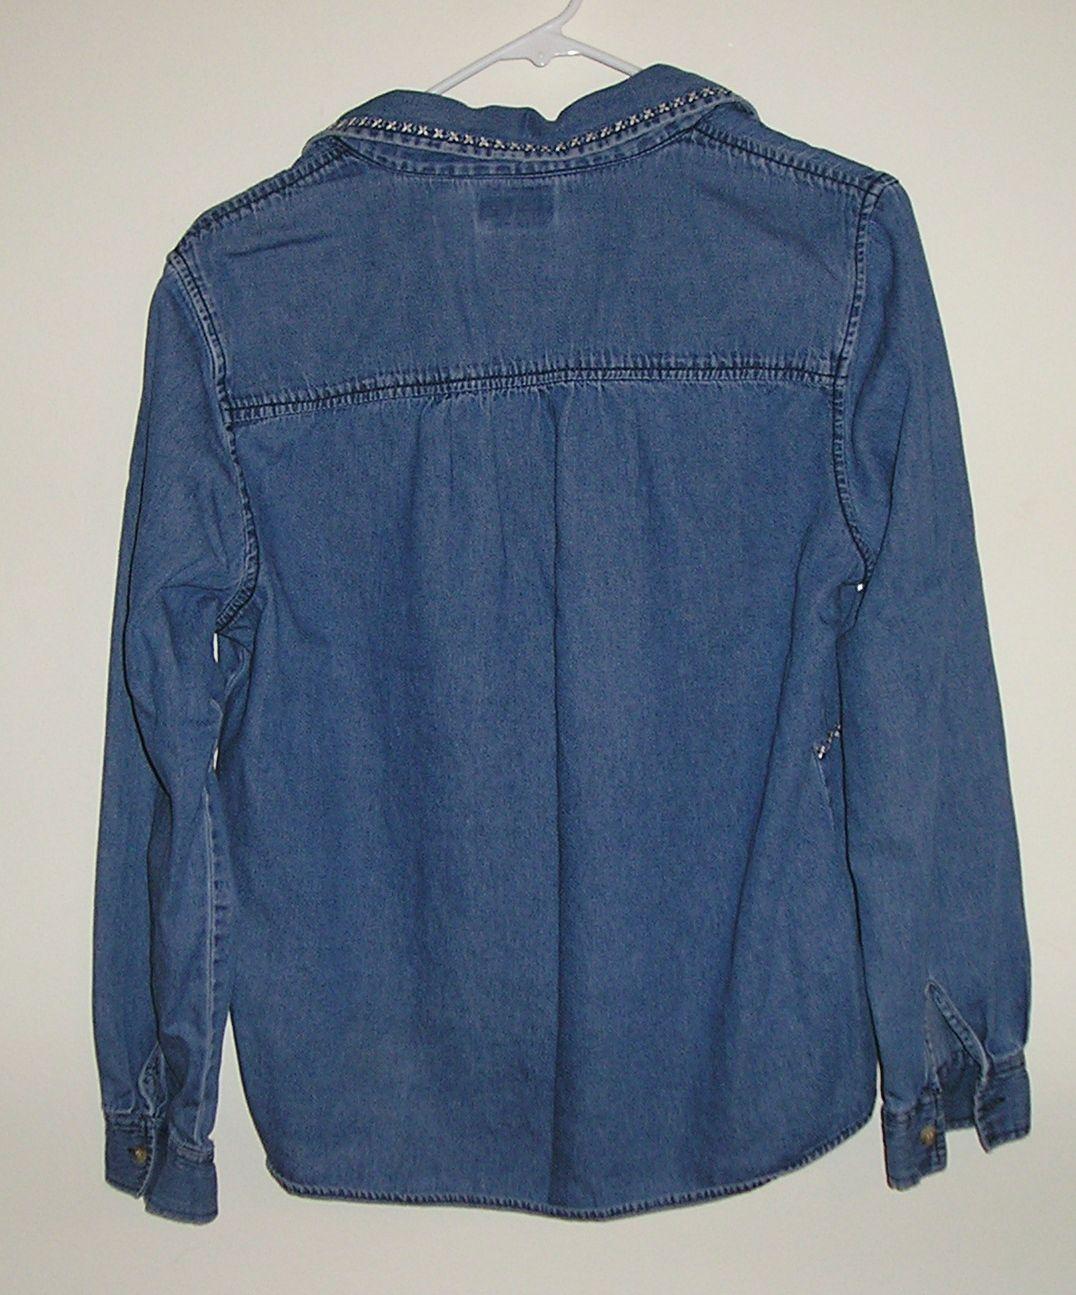 BOBBIE BROOKS Long Sleeve Women's Denim Blue Blouse Shirt Size Medium M / 8 NICE